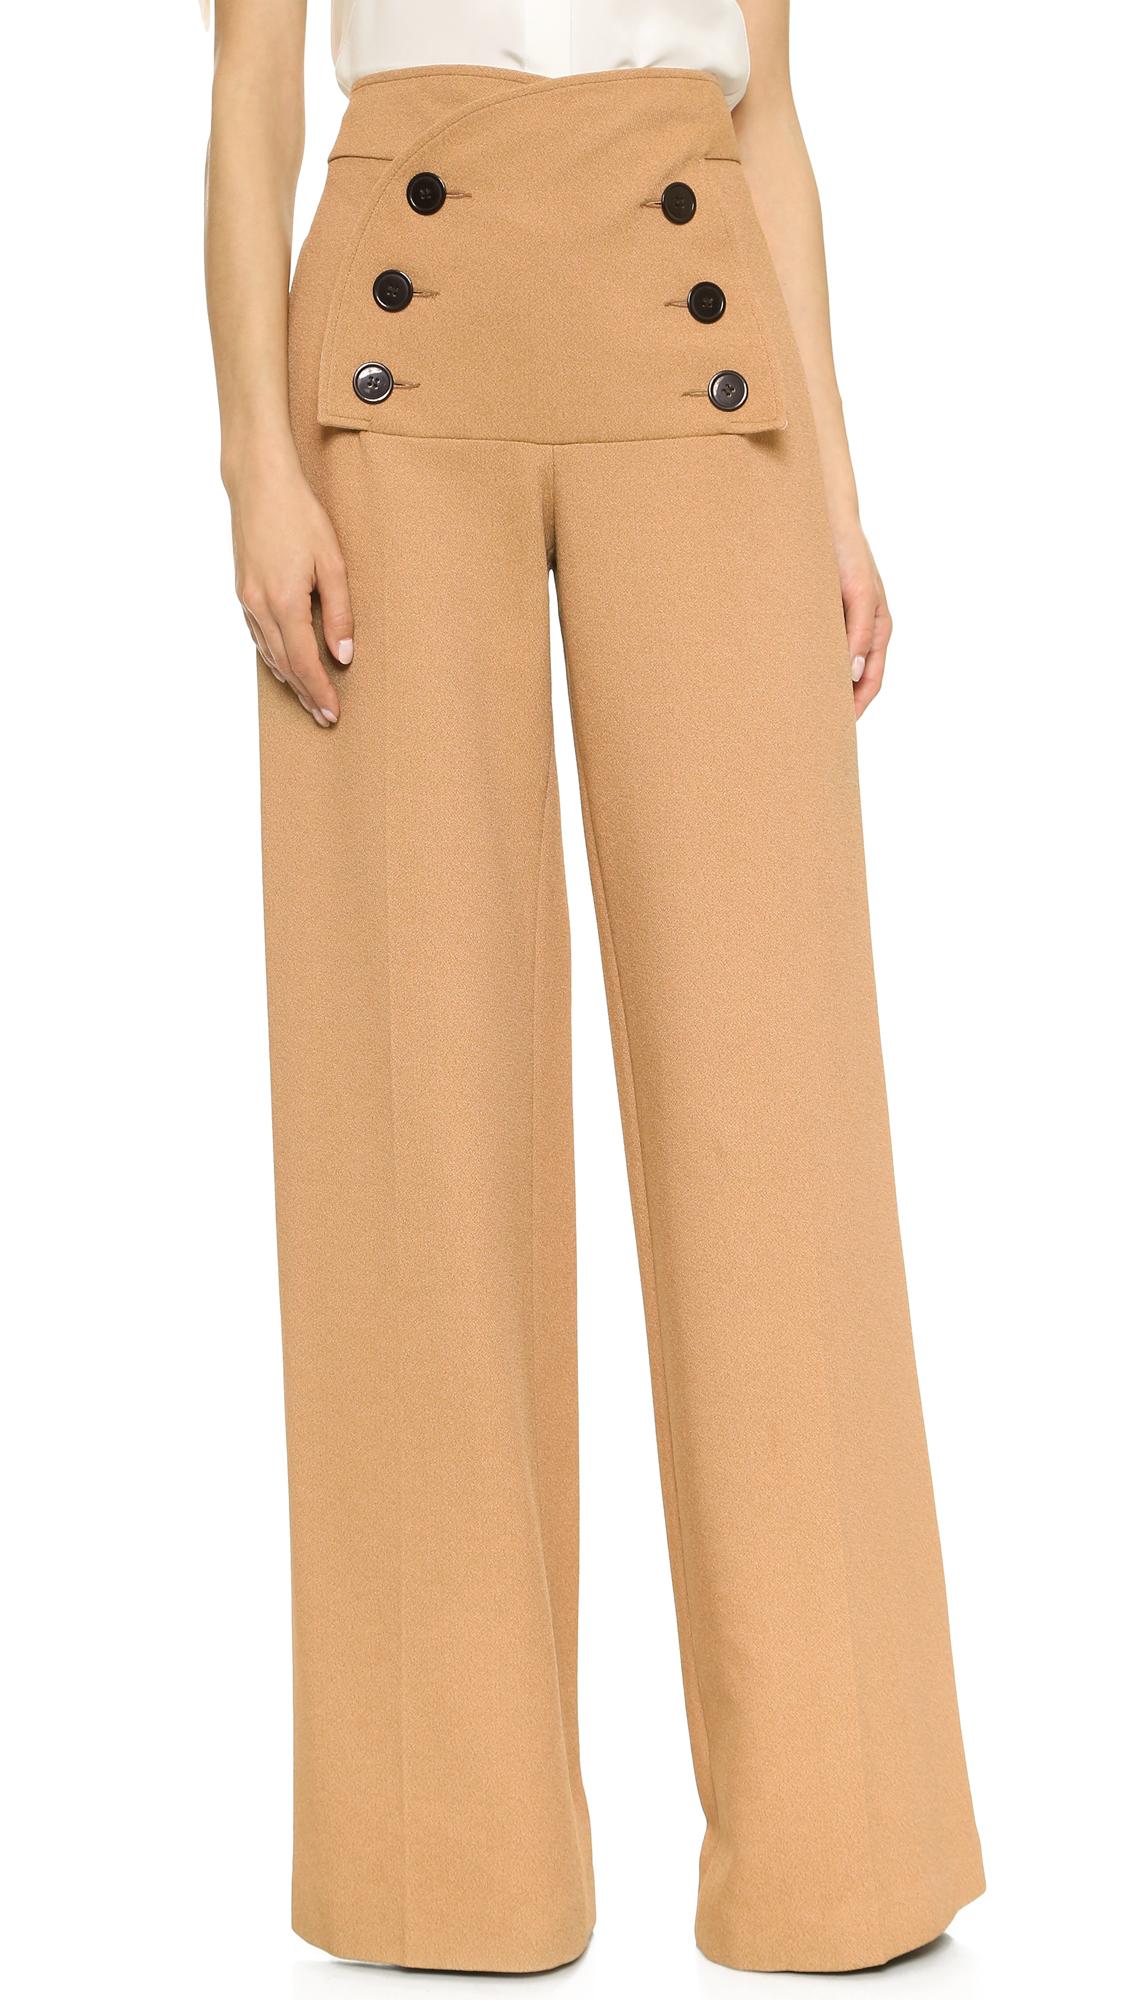 Derek Lam Button Sailor Pants Camel In Brown Lyst